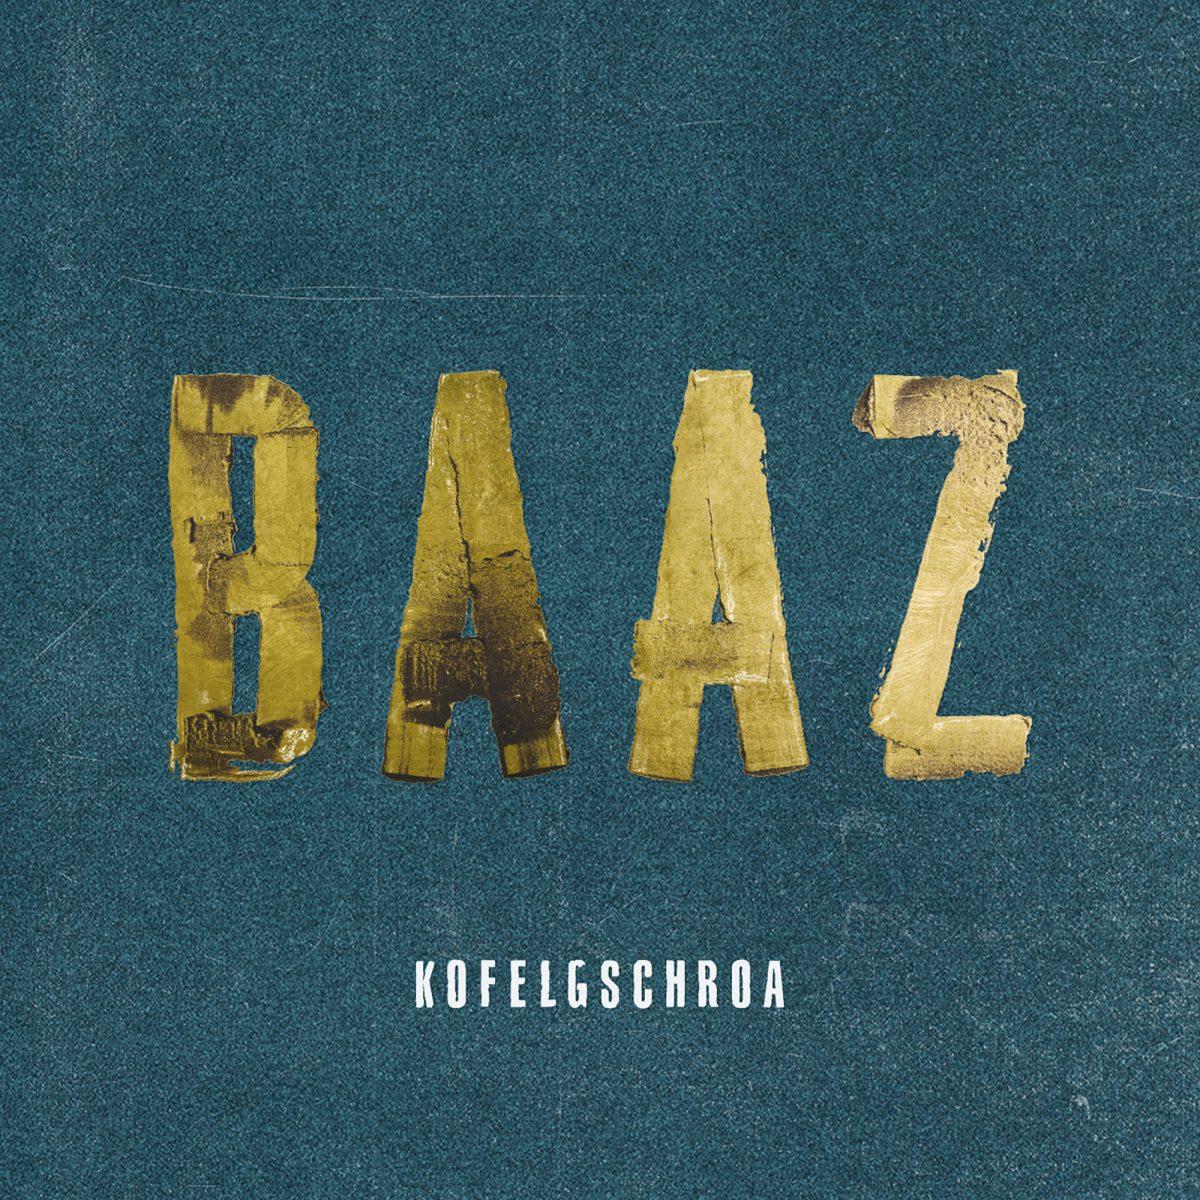 Kofelgschroa: Baaz (2016)